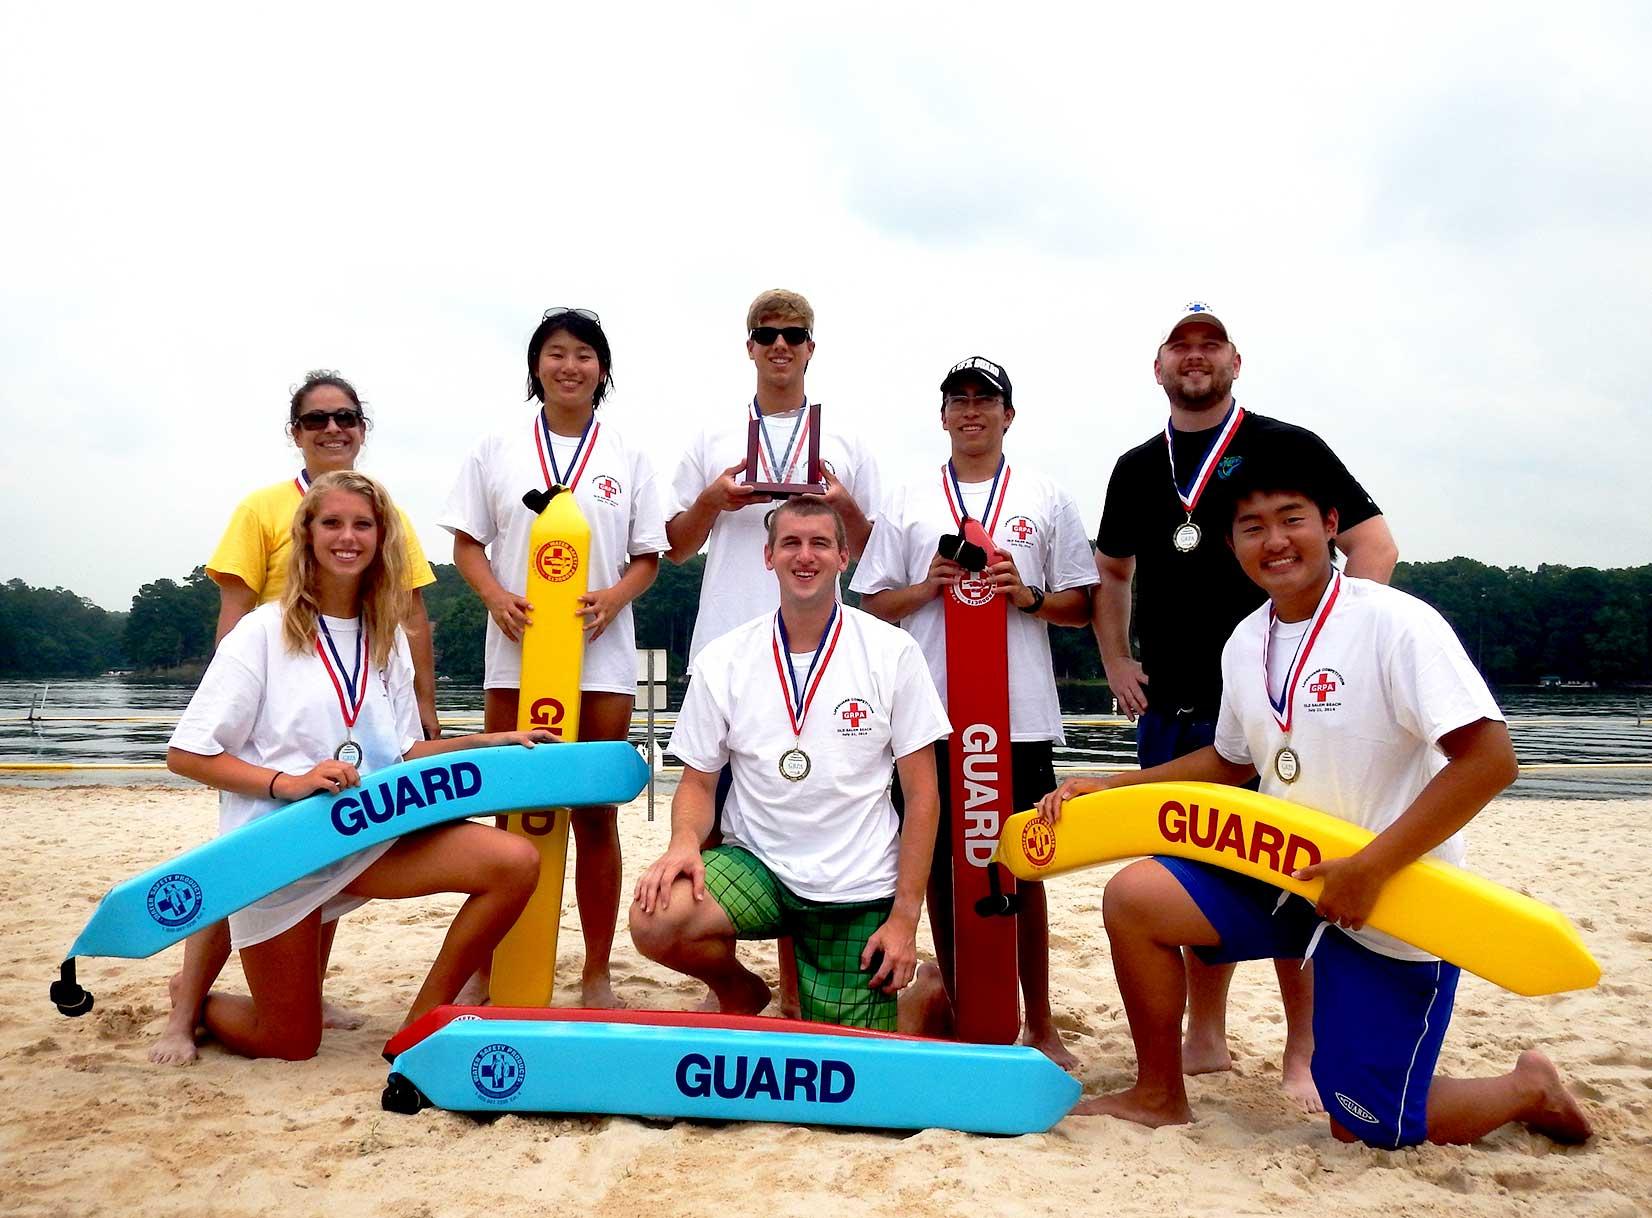 Gwinnett County Parks Lifeguard State Champions 2014